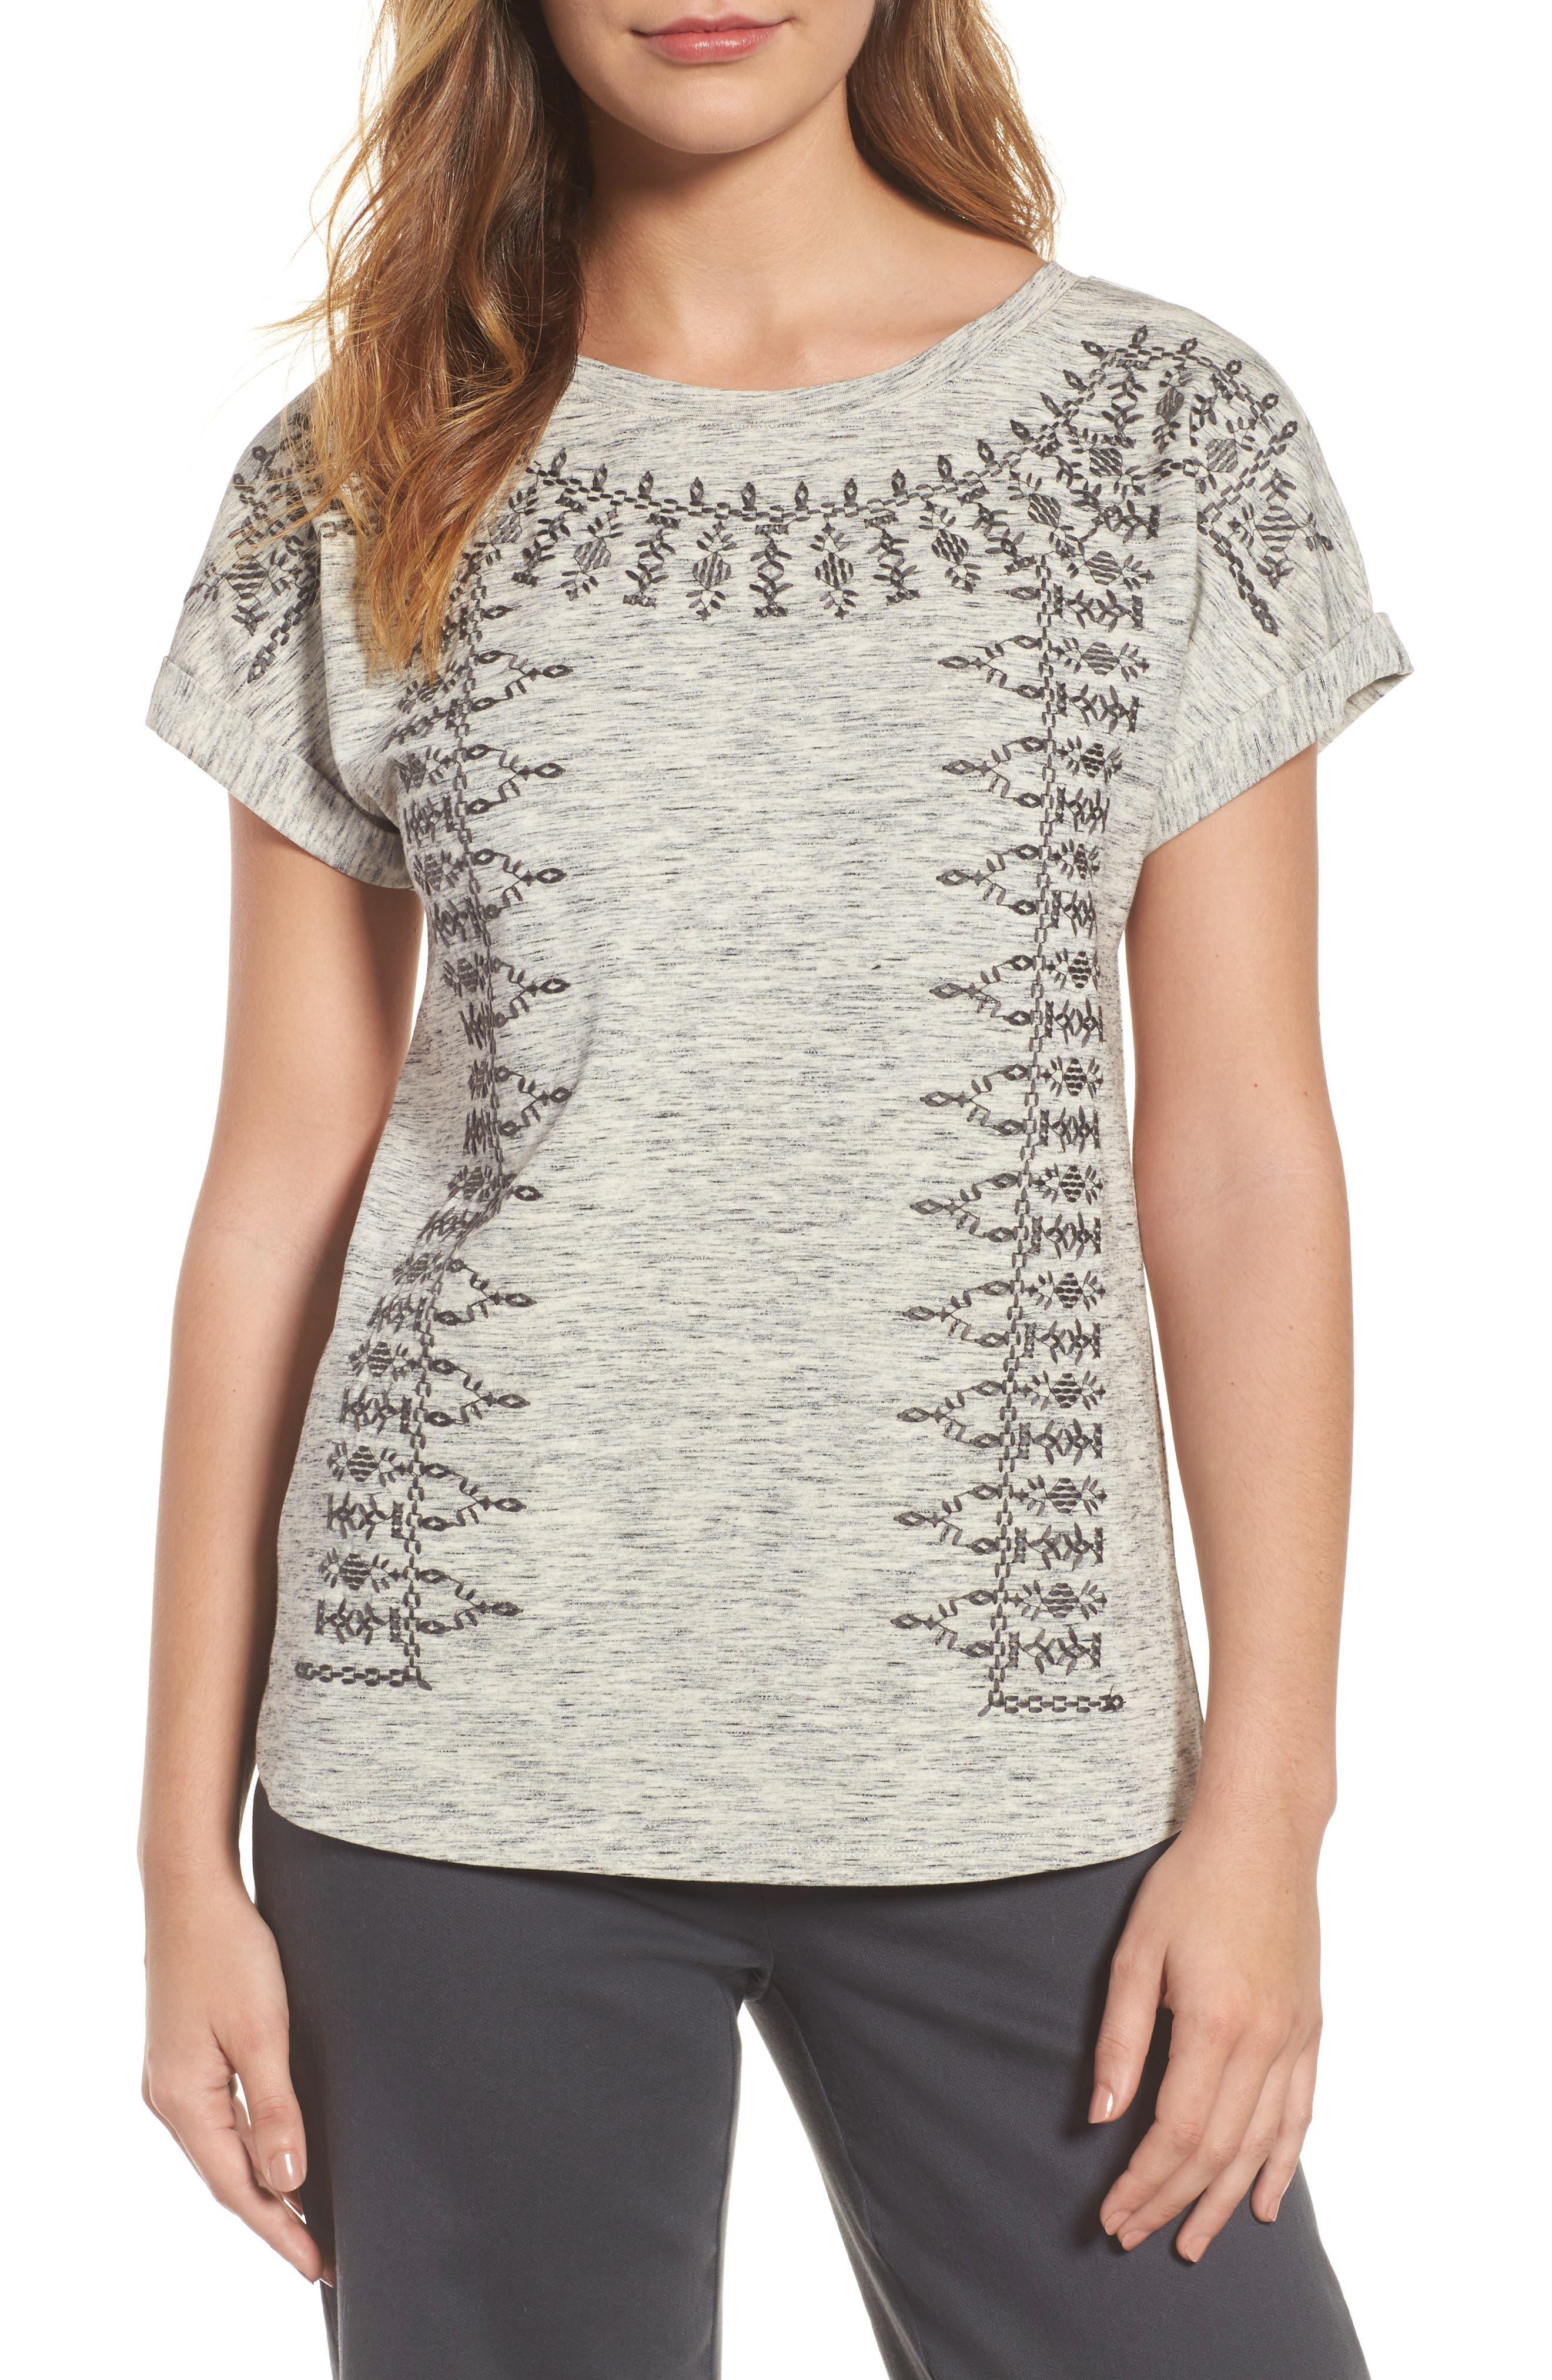 Henna Short Sleeve Top,                             Main thumbnail 1, color,                             050